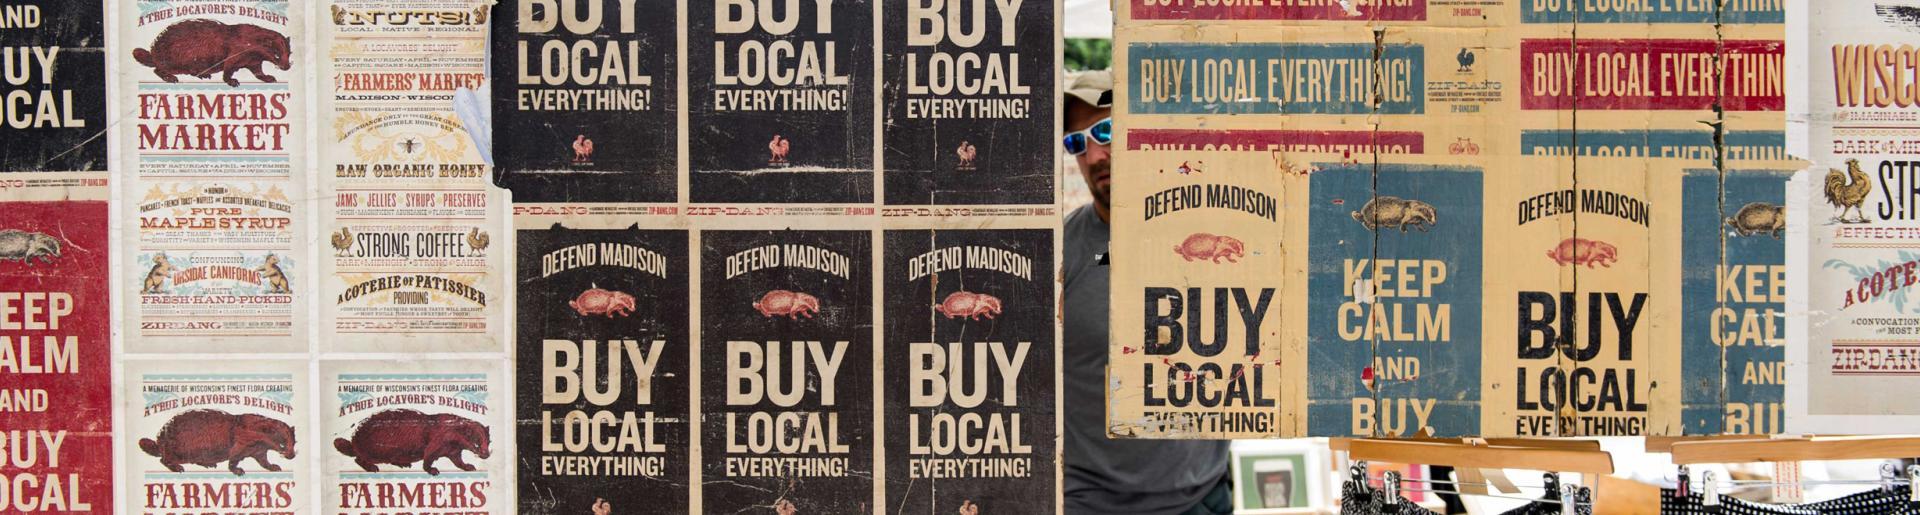 Buy Local!